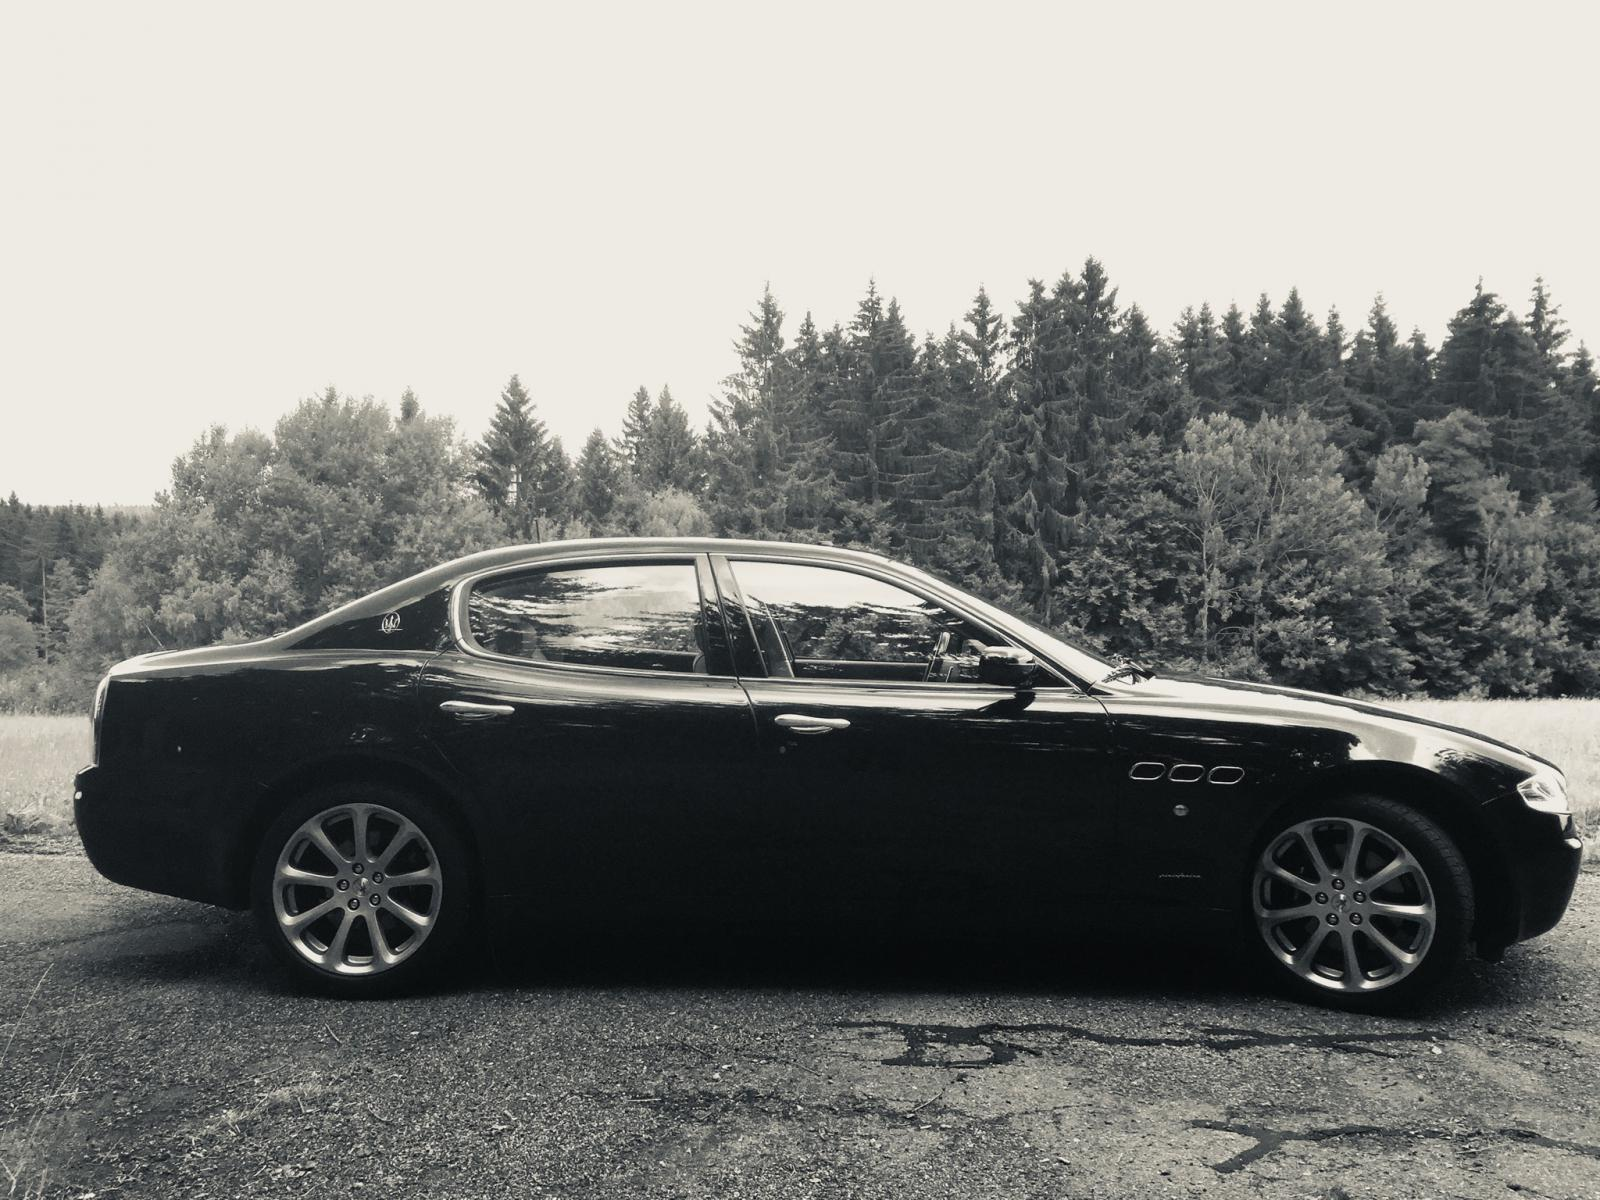 2005 Maserati Quattroporte V M139, generation #5 gasoline